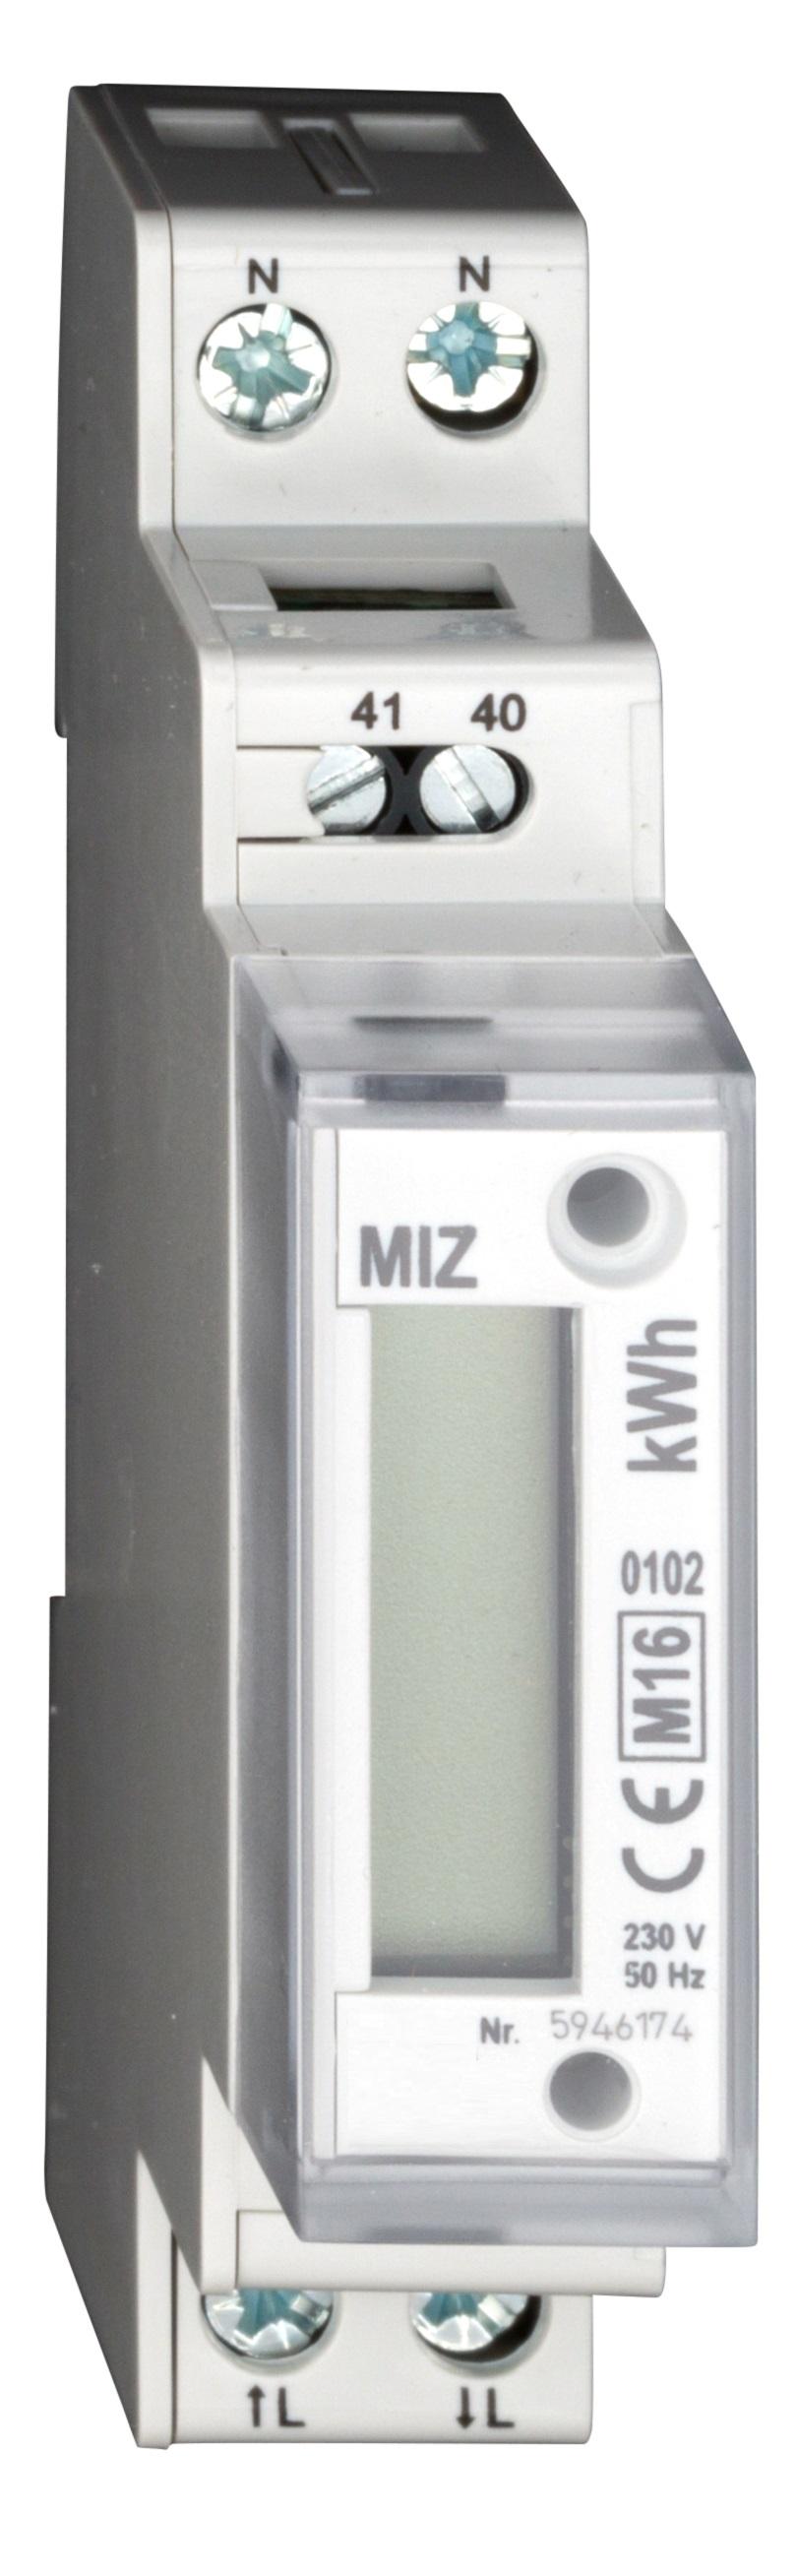 1 Stk Digitaler Zähler 1 phasig 32A, 1 TE m. MID MGMIZ132--